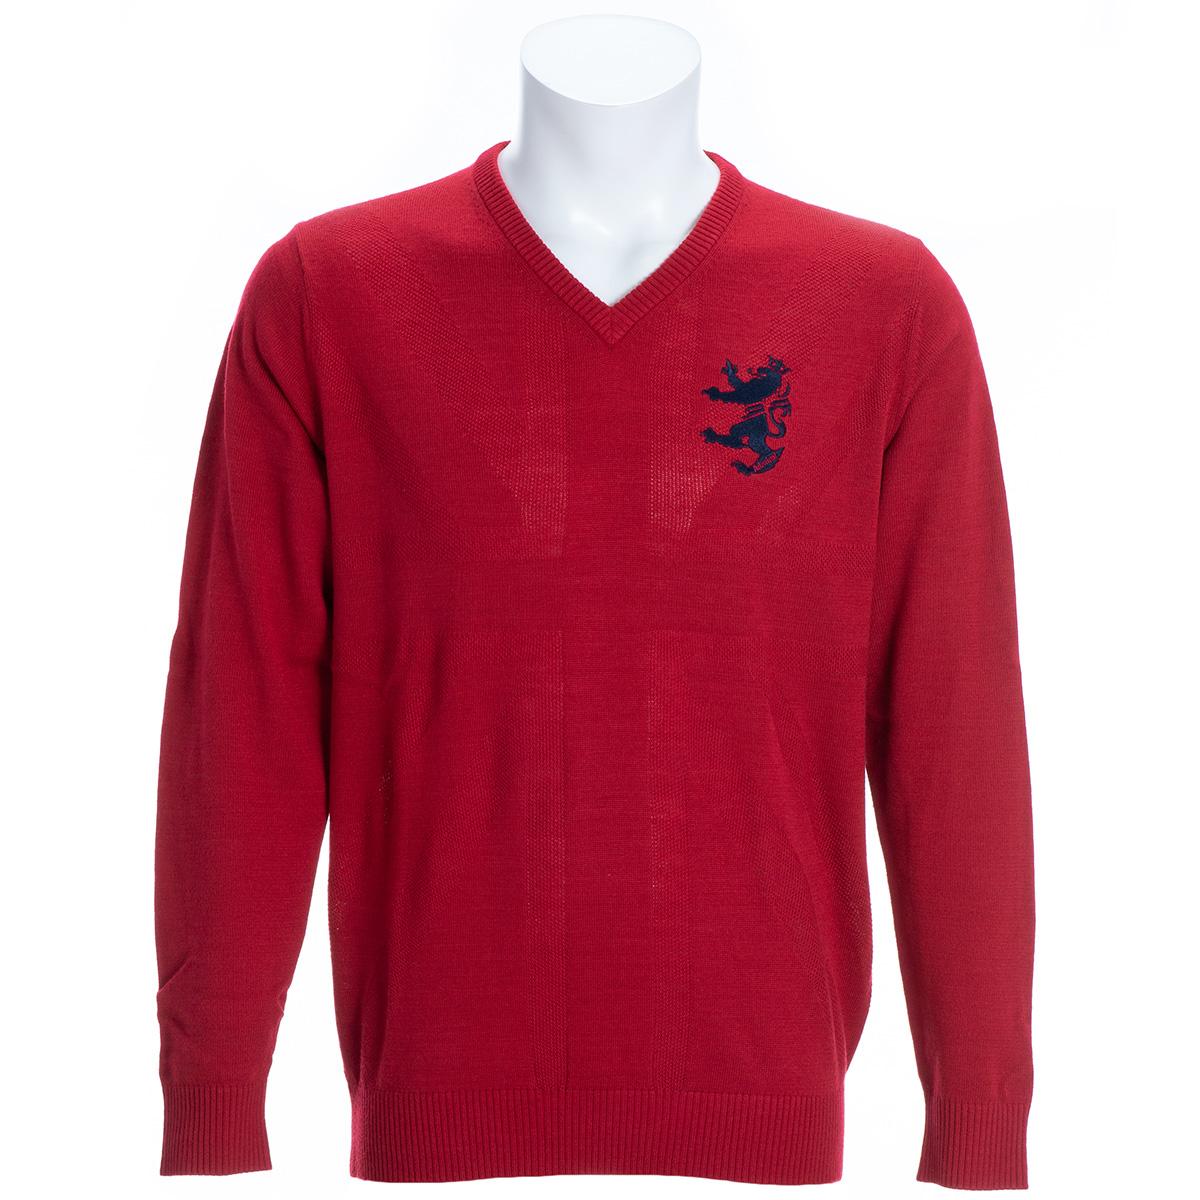 UJ Vネックセーター